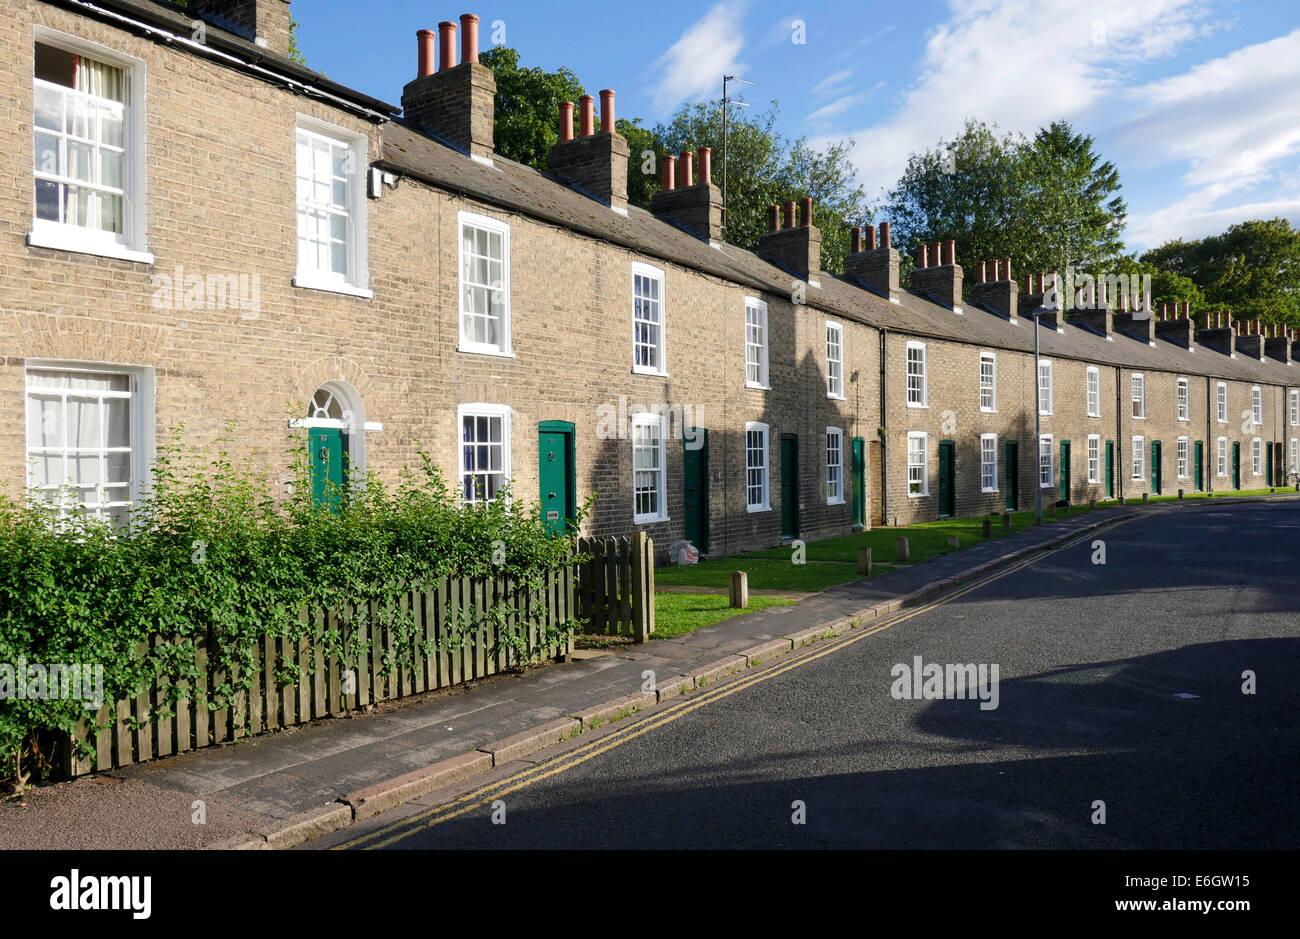 brick Terraced housing, Cambridge England - Stock Image